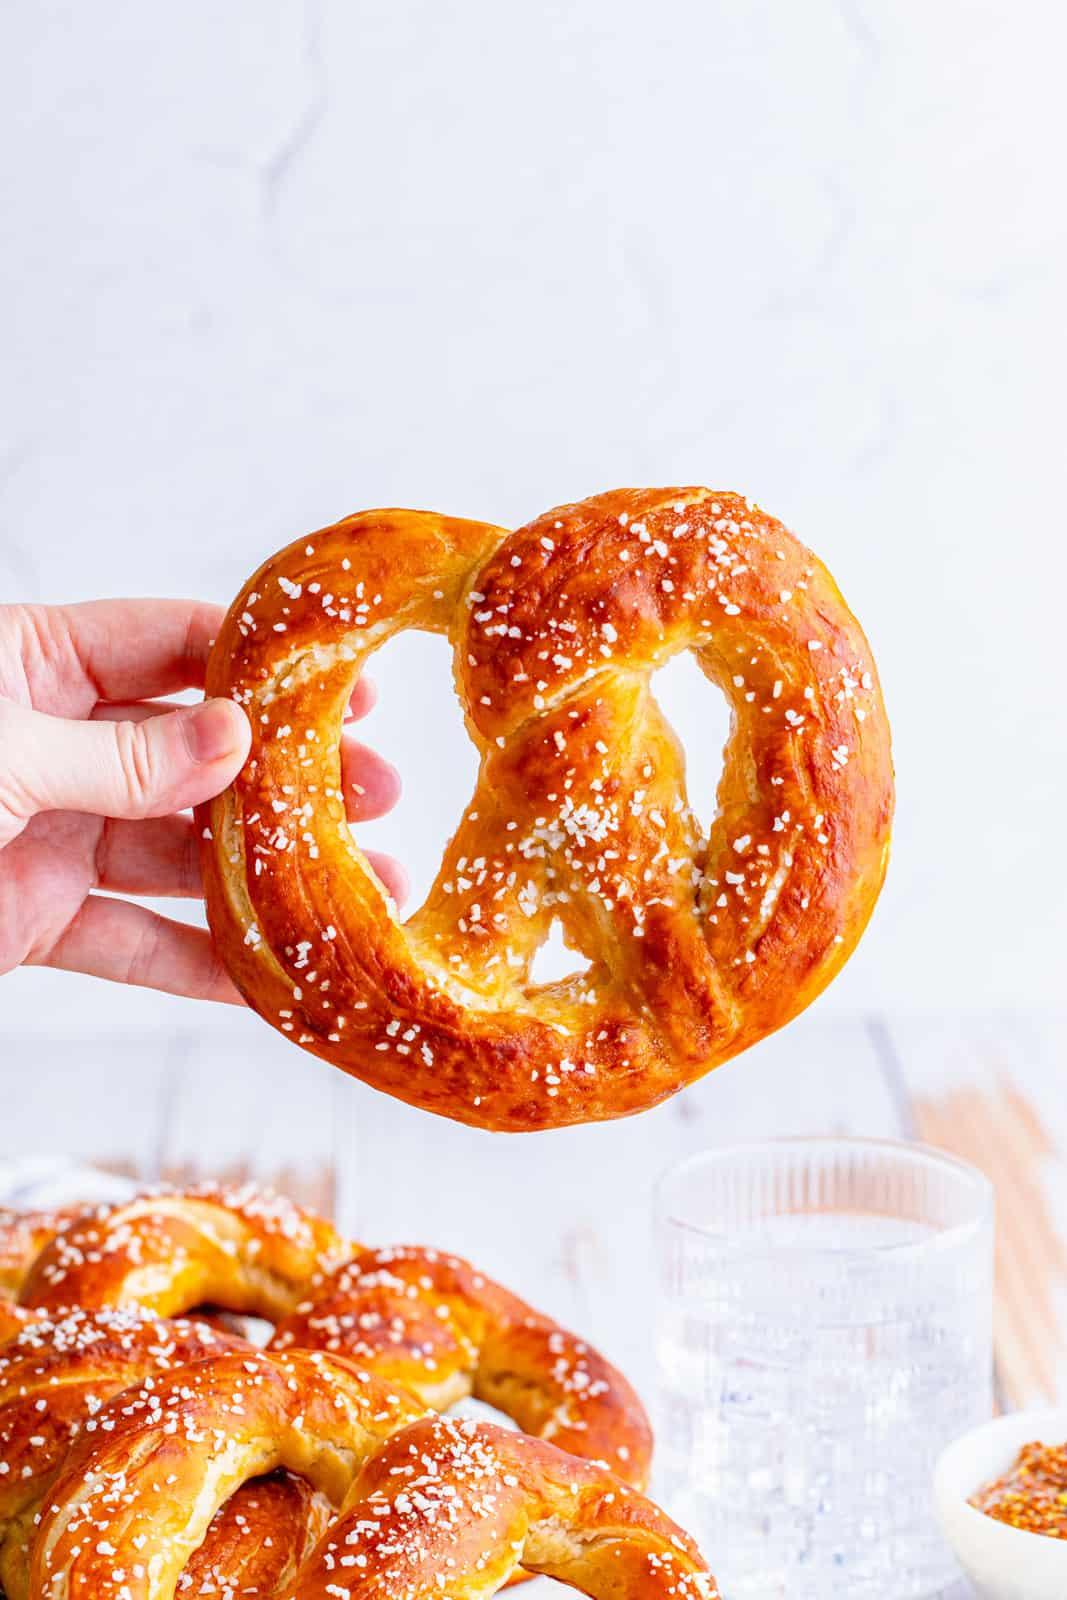 Hand holding up one pretzel